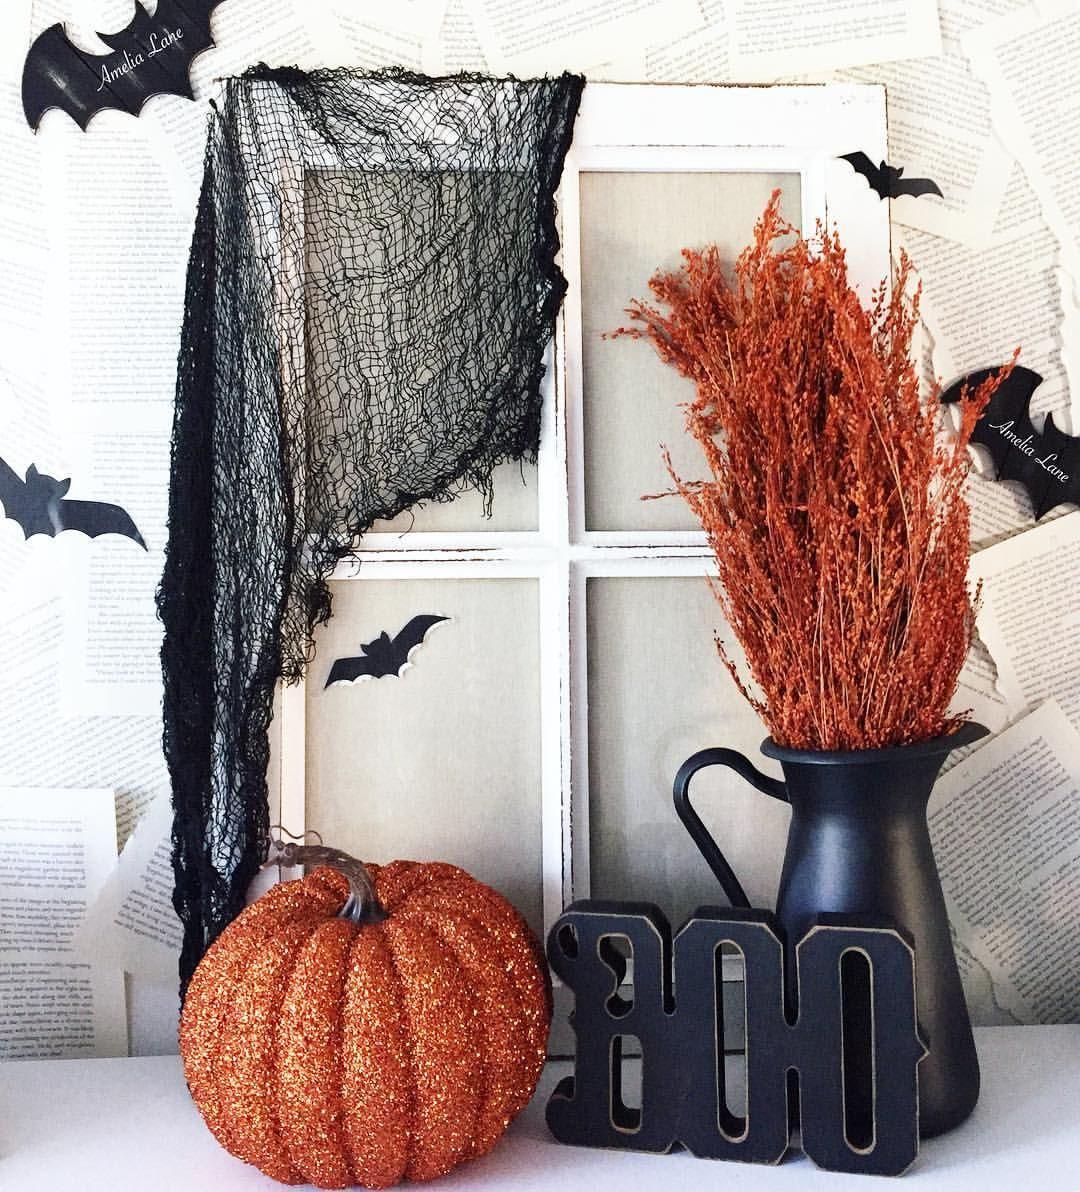 2ea3b706aba18f52a1aee848f1f1aa88 - Better Homes And Gardens Halloween Tricks And Treats Magazine 2017